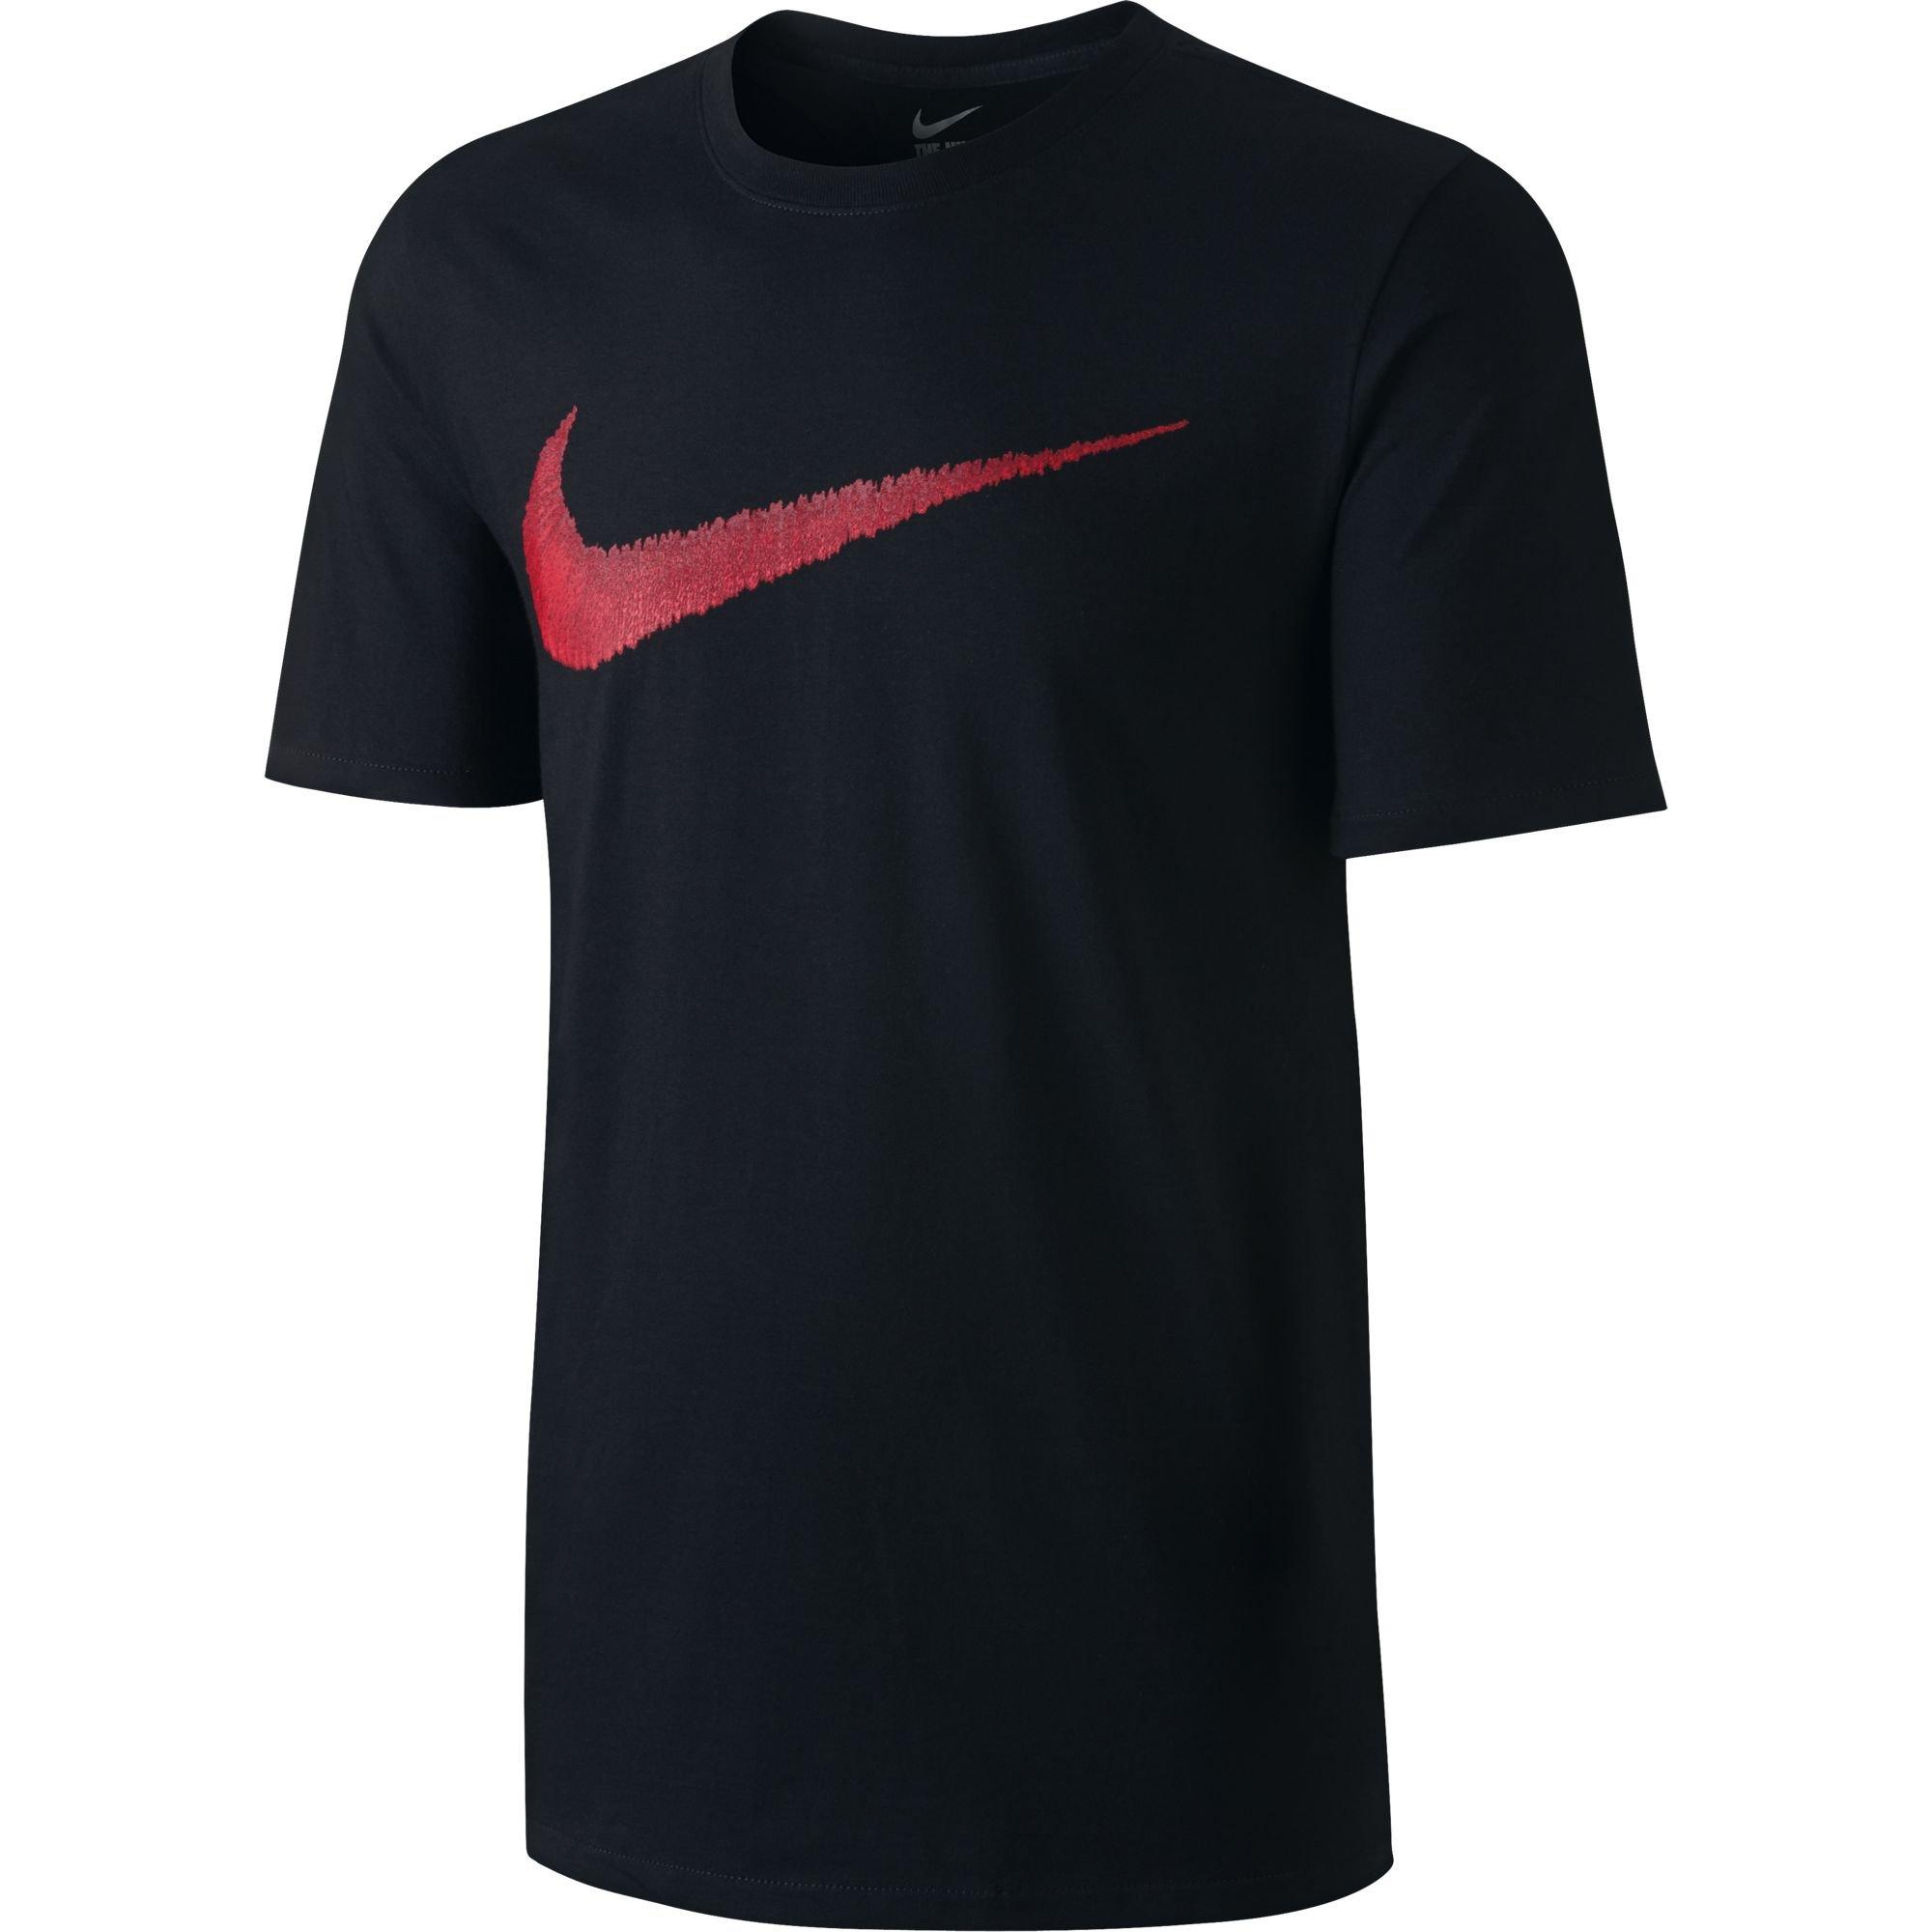 NIKE Sportswear Men's Hangtag Swoosh Tee, Black/Sport Red, X-Small